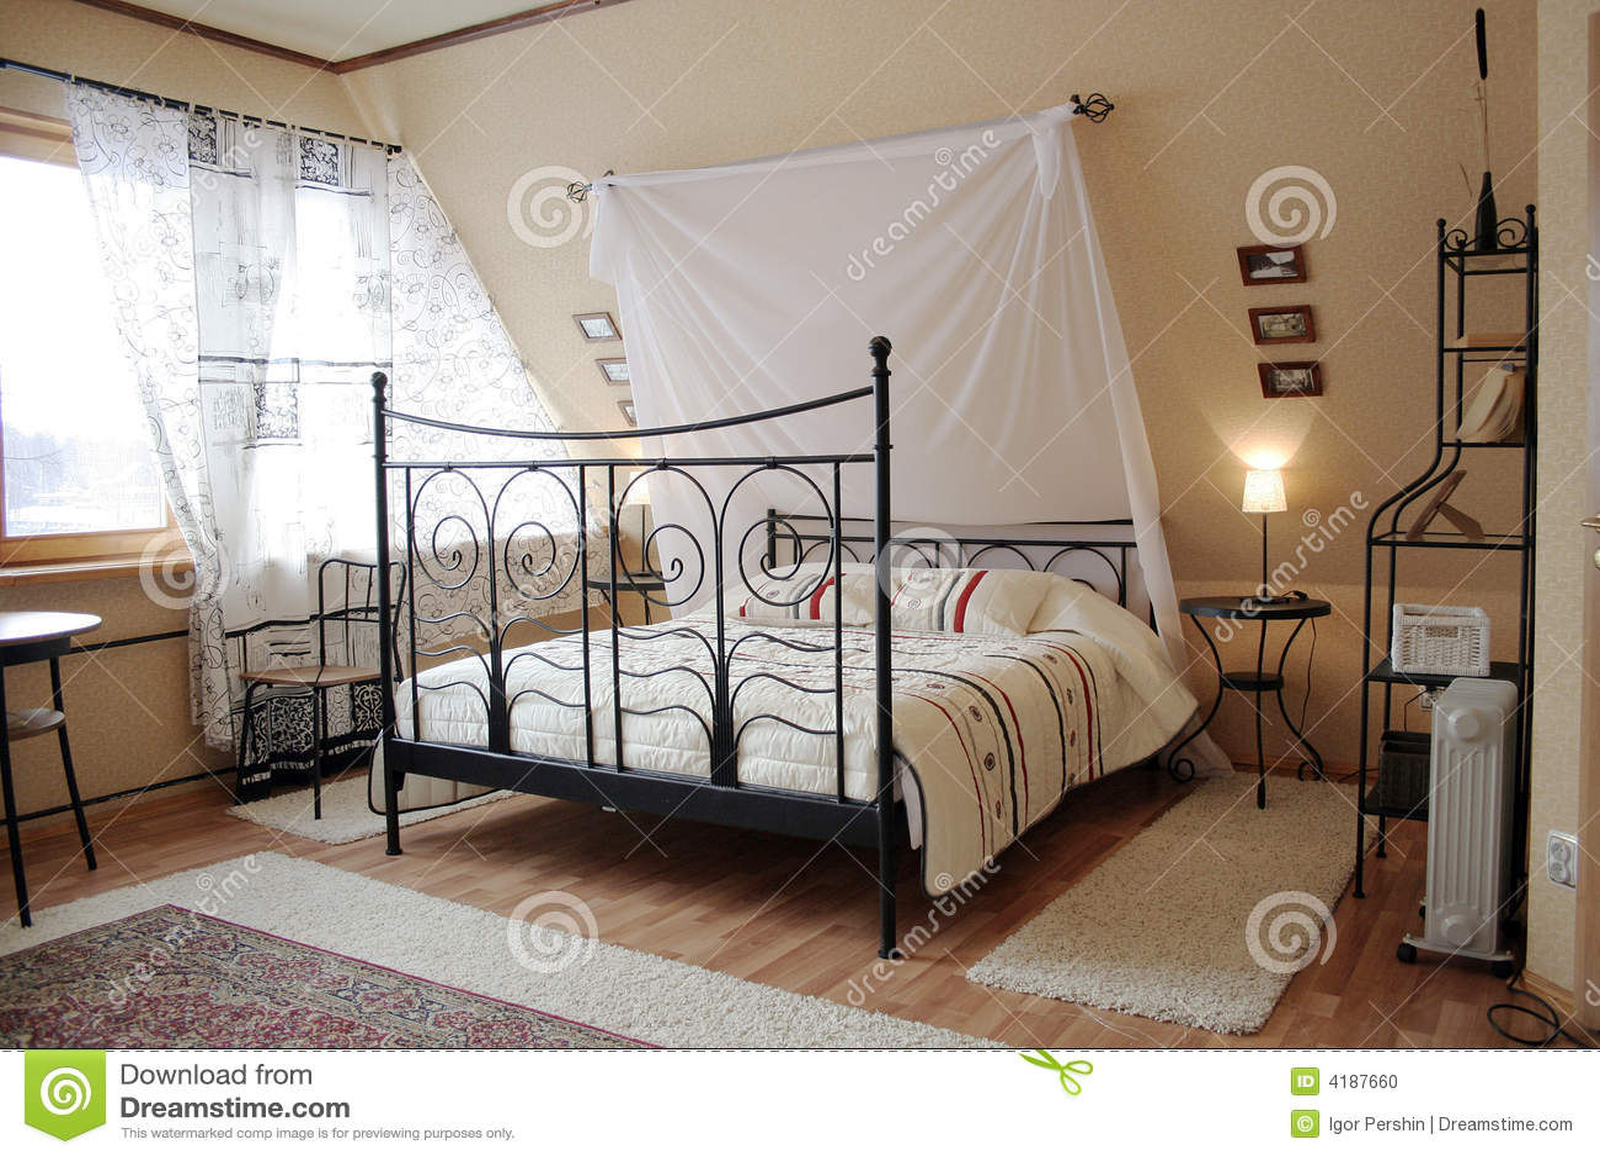 Light sleeping room 2 Stock Photo. Sleeping Room Royalty Free Stock Photos   Image  10963448